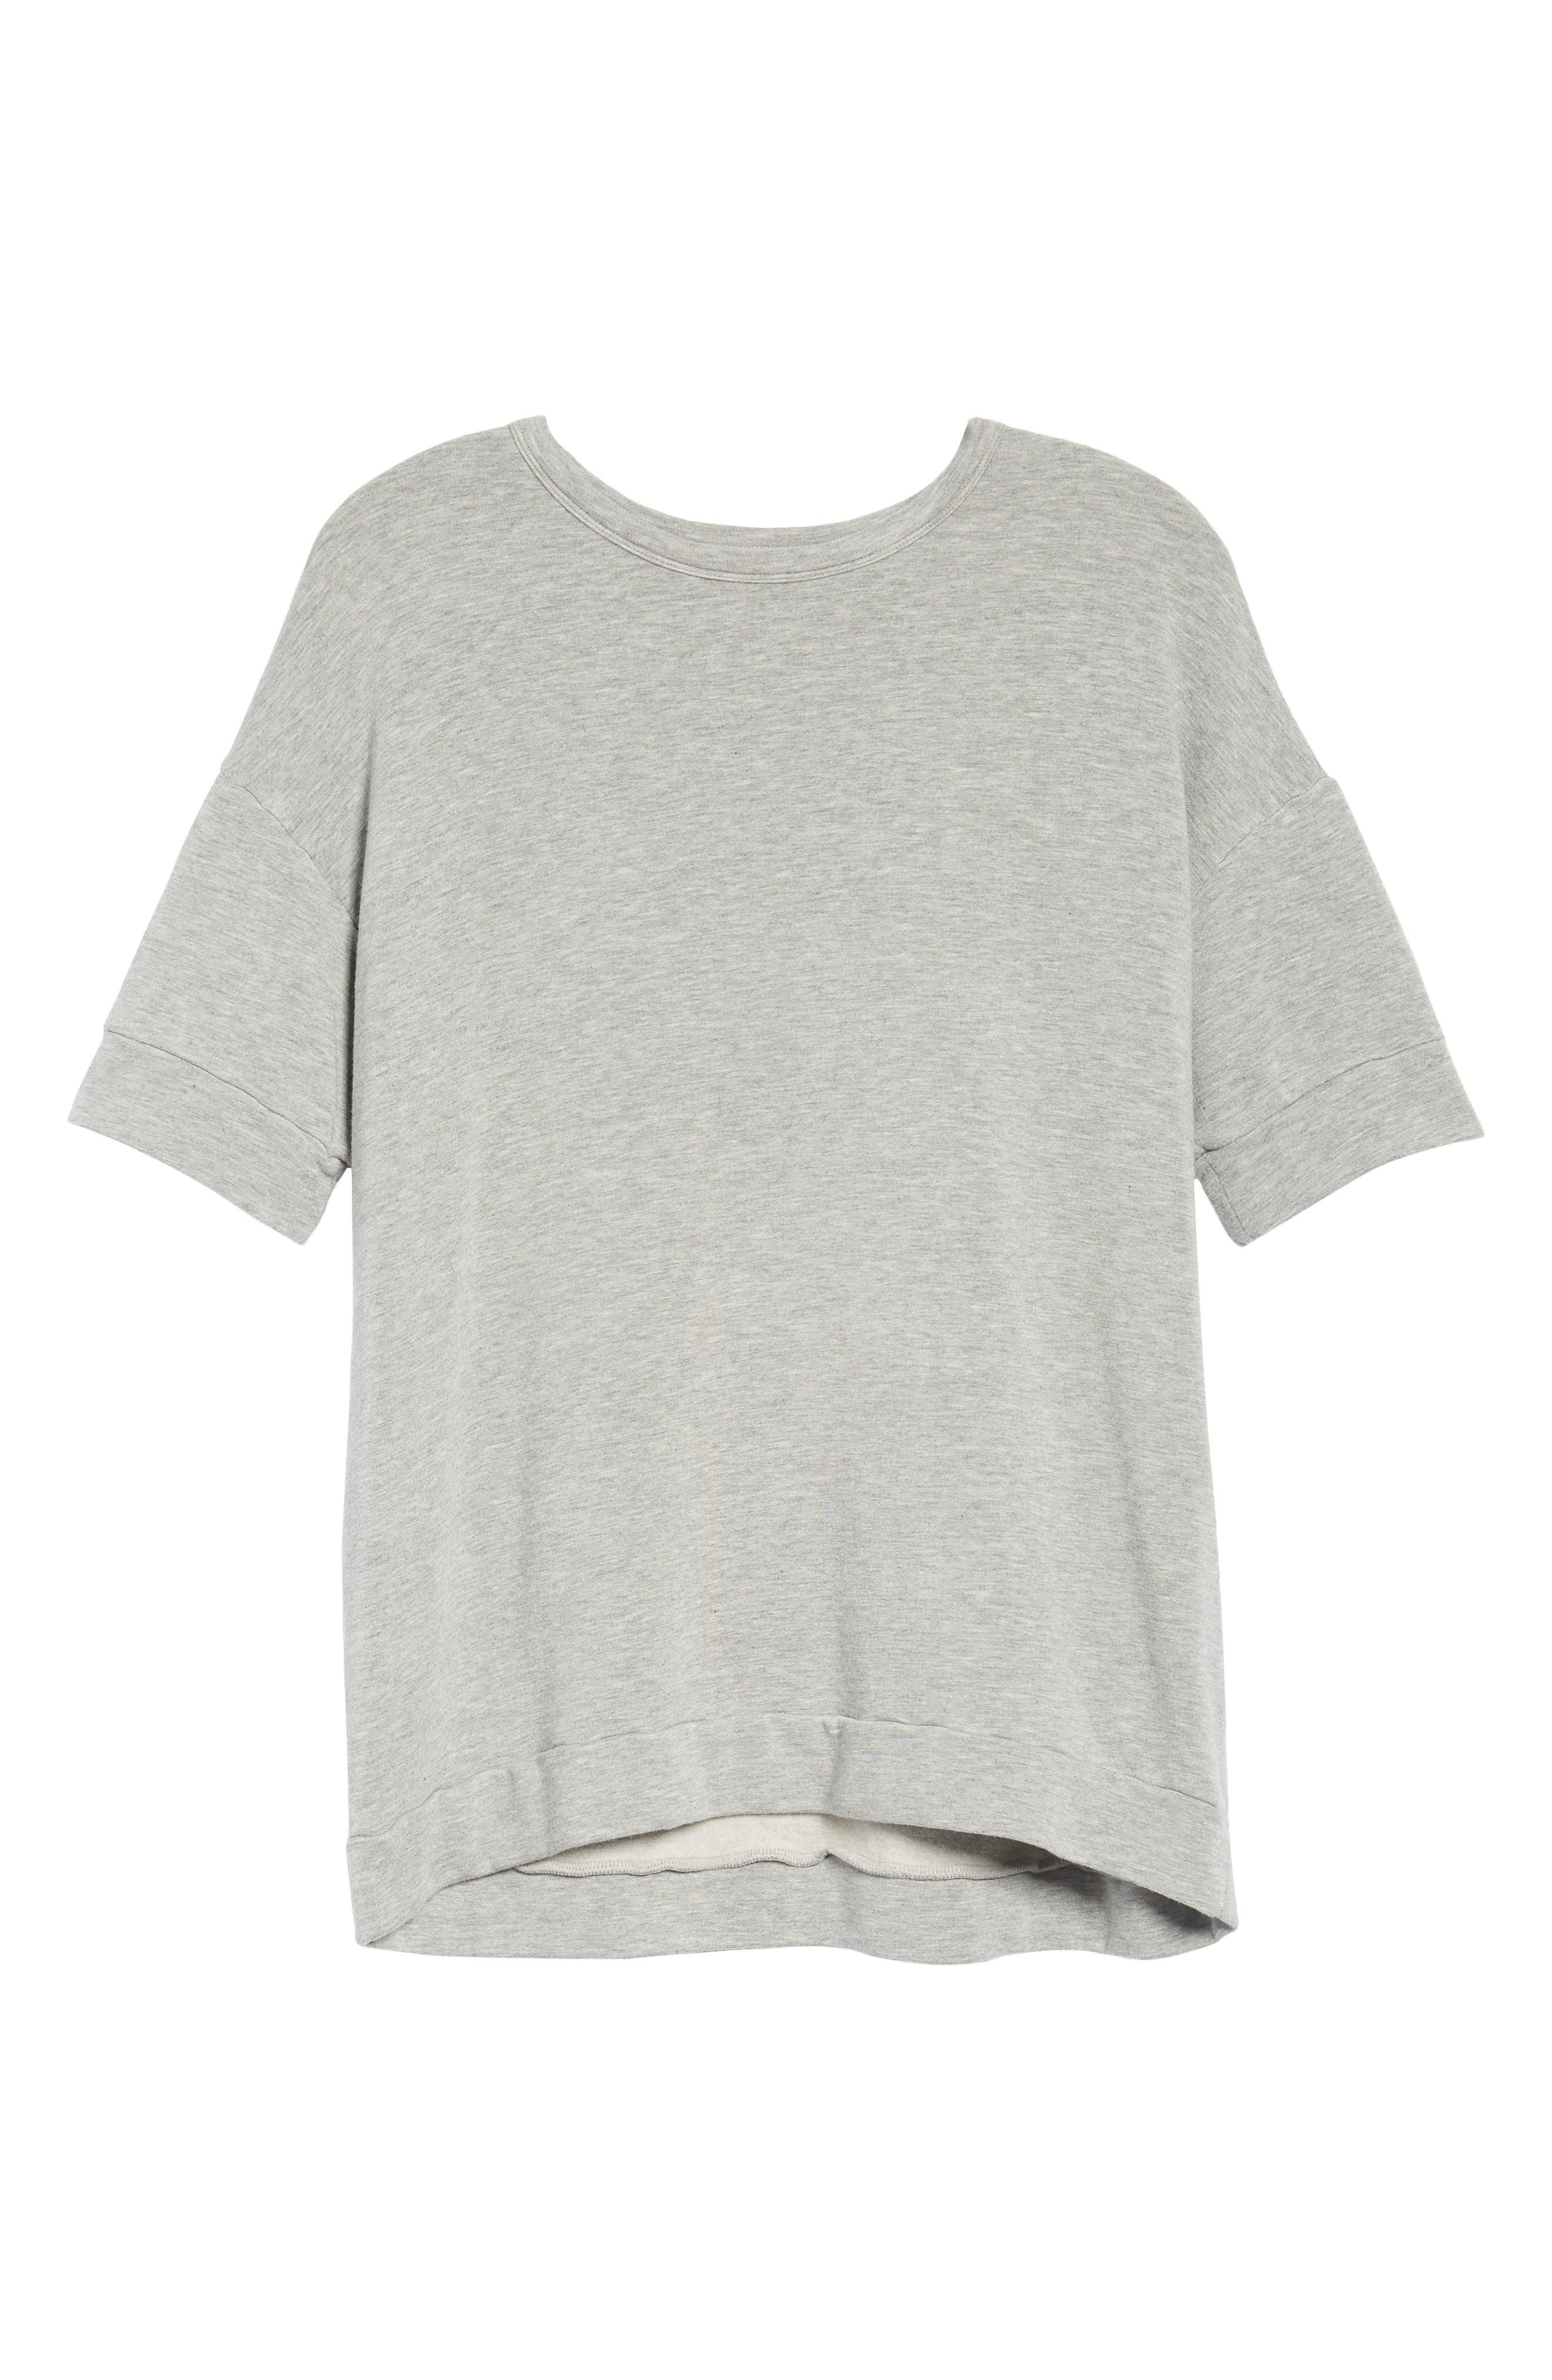 Short Sleeve Sweatshirt,                             Alternate thumbnail 6, color,                             050